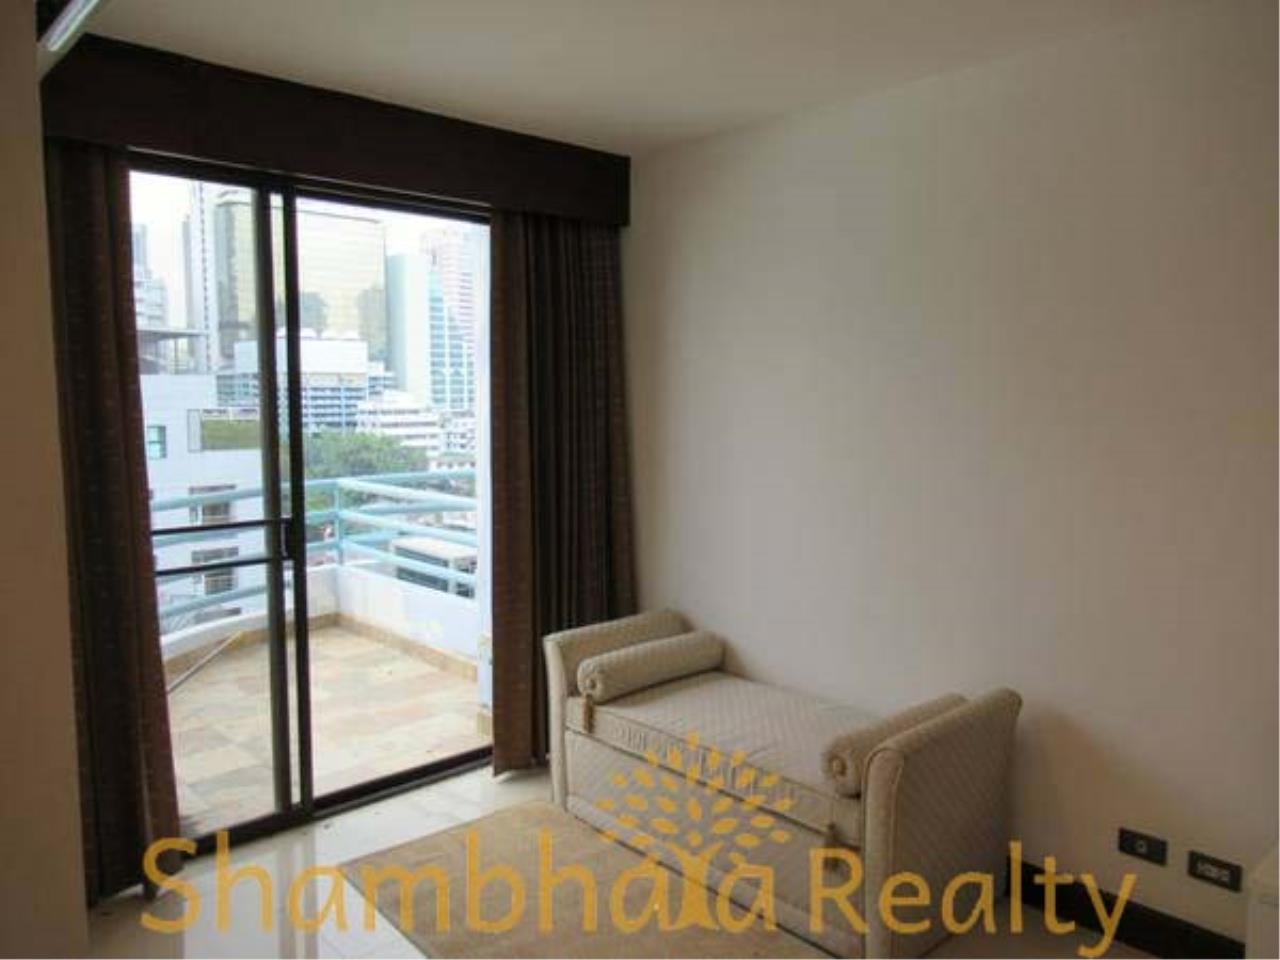 Shambhala Realty Agency's Pearl Garden Condominium for Rent in Silom/Sathorn 11